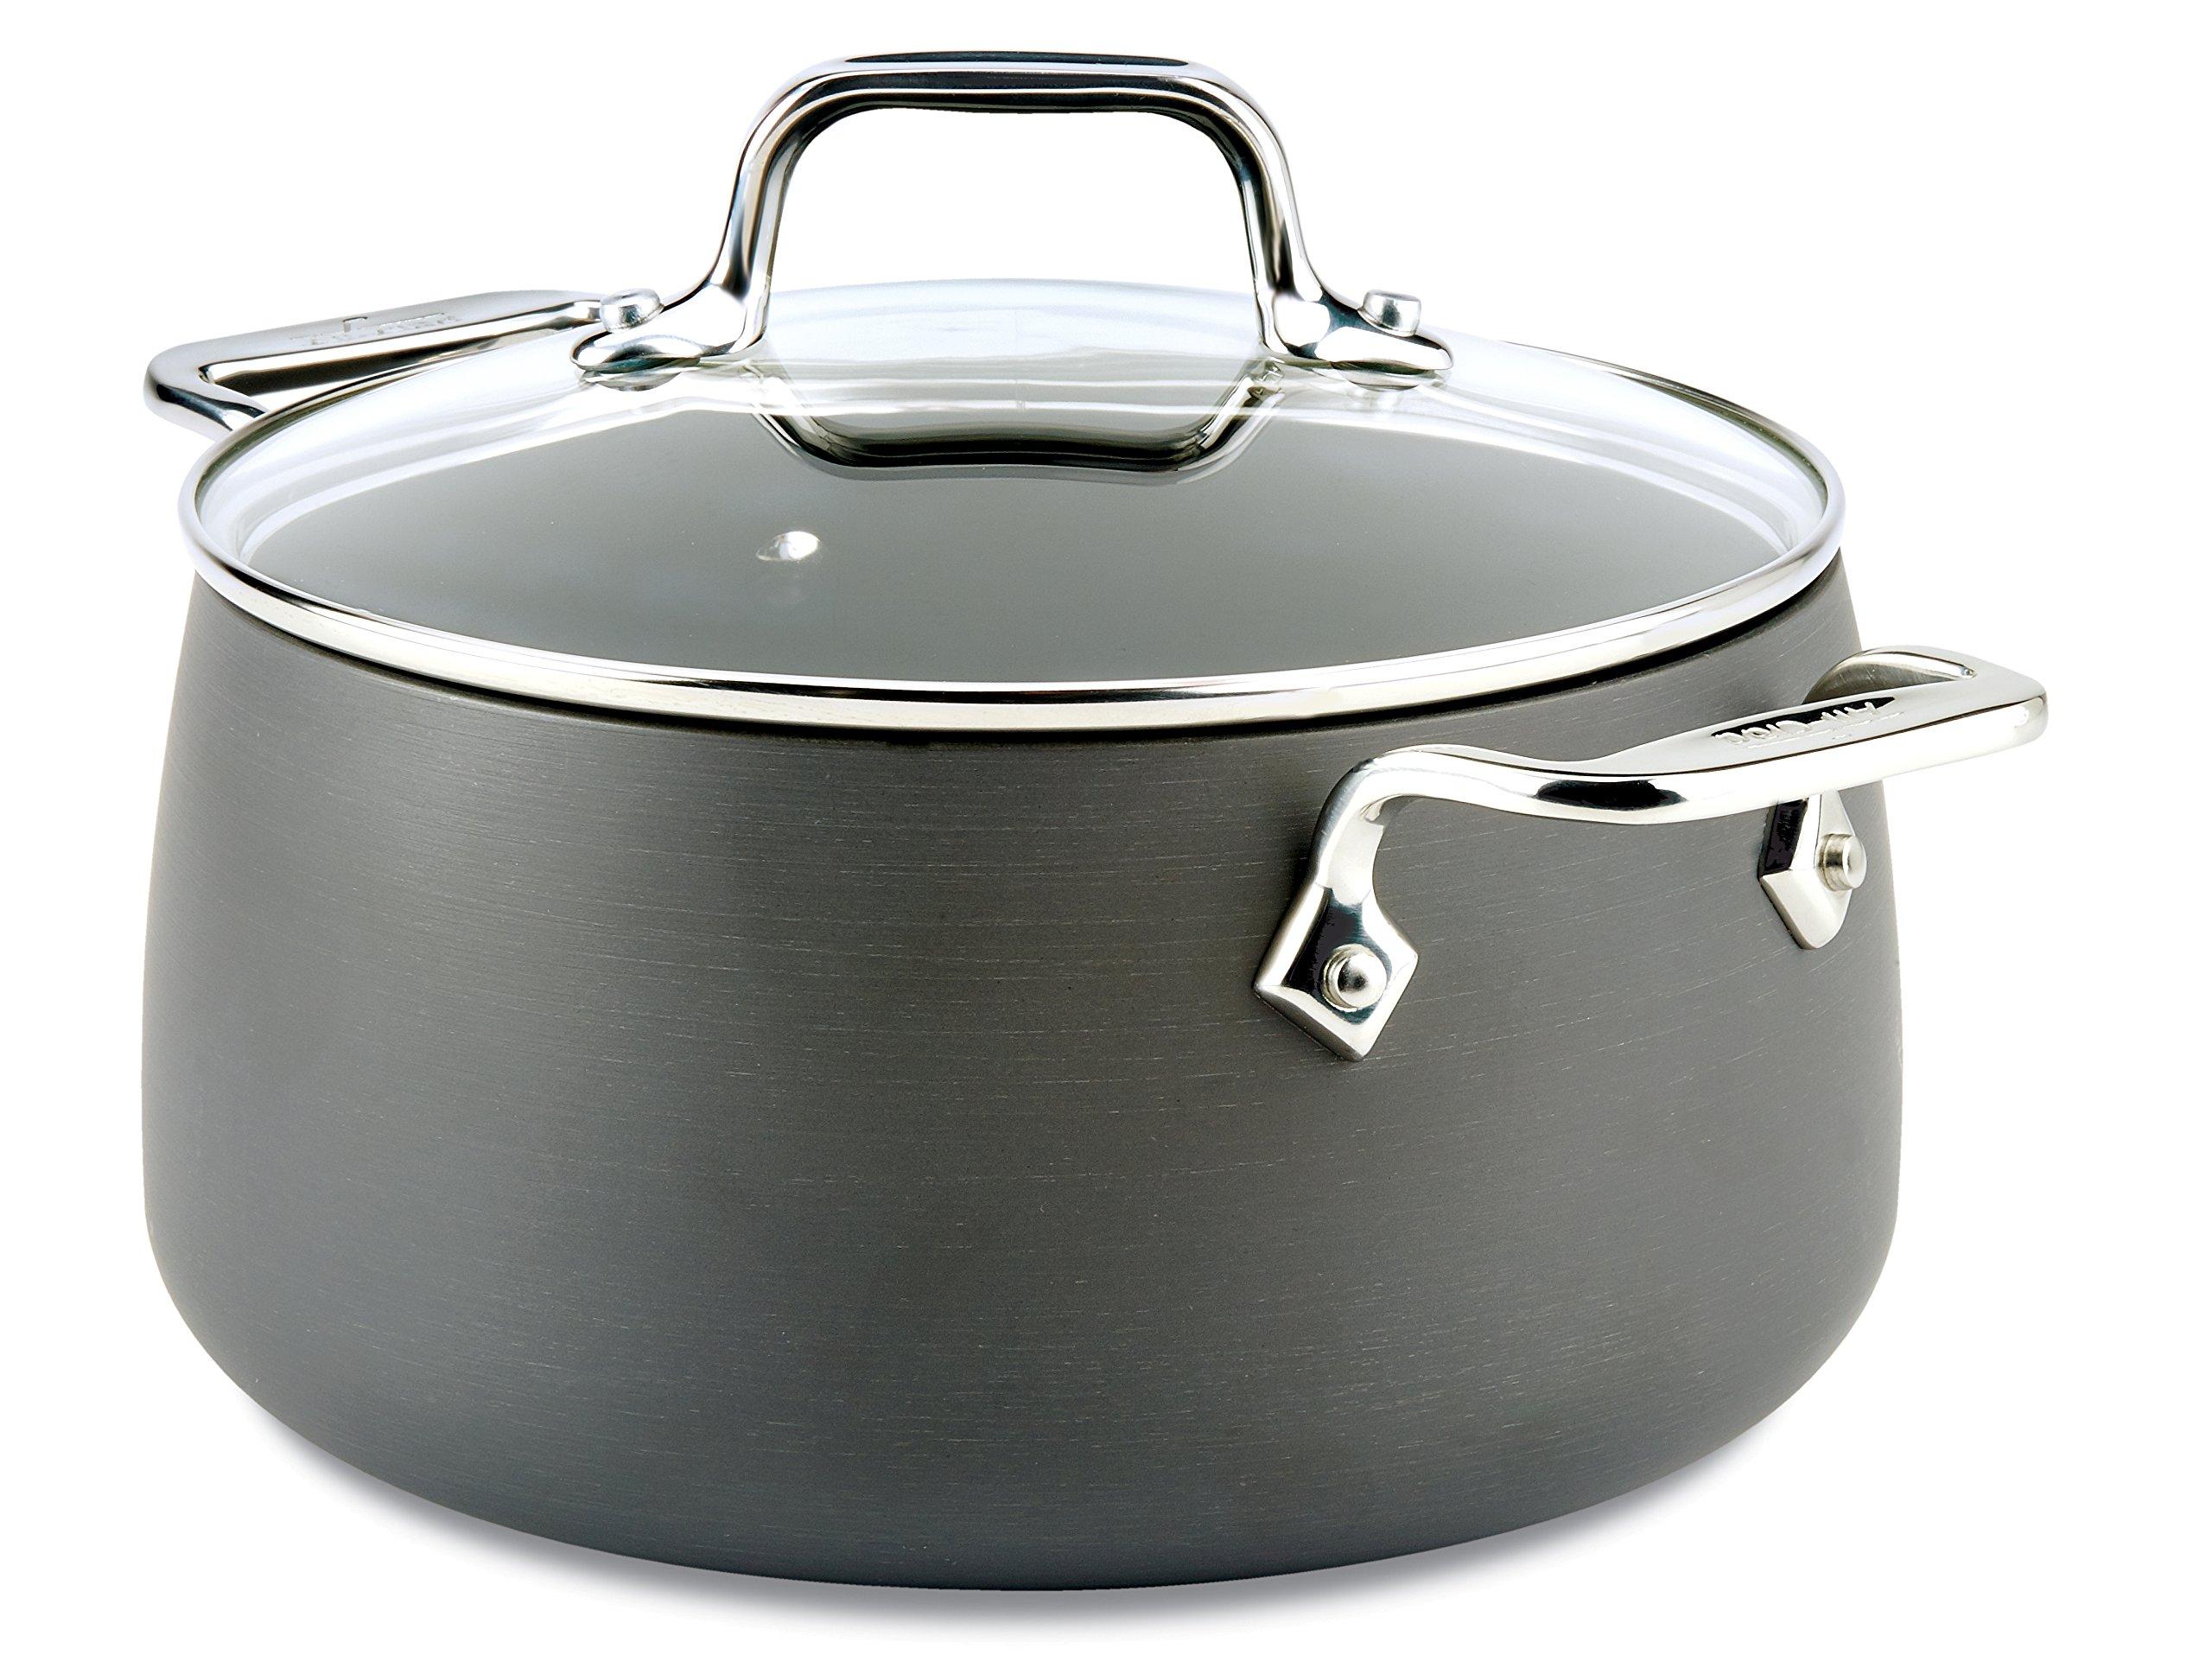 All-Clad E7854464 HA1 Hard Anodized Nonstick Dishwasher Safe PFOA Free Soup Pot/Stock Pot Cookware, 4-Quart, Black by All-Clad